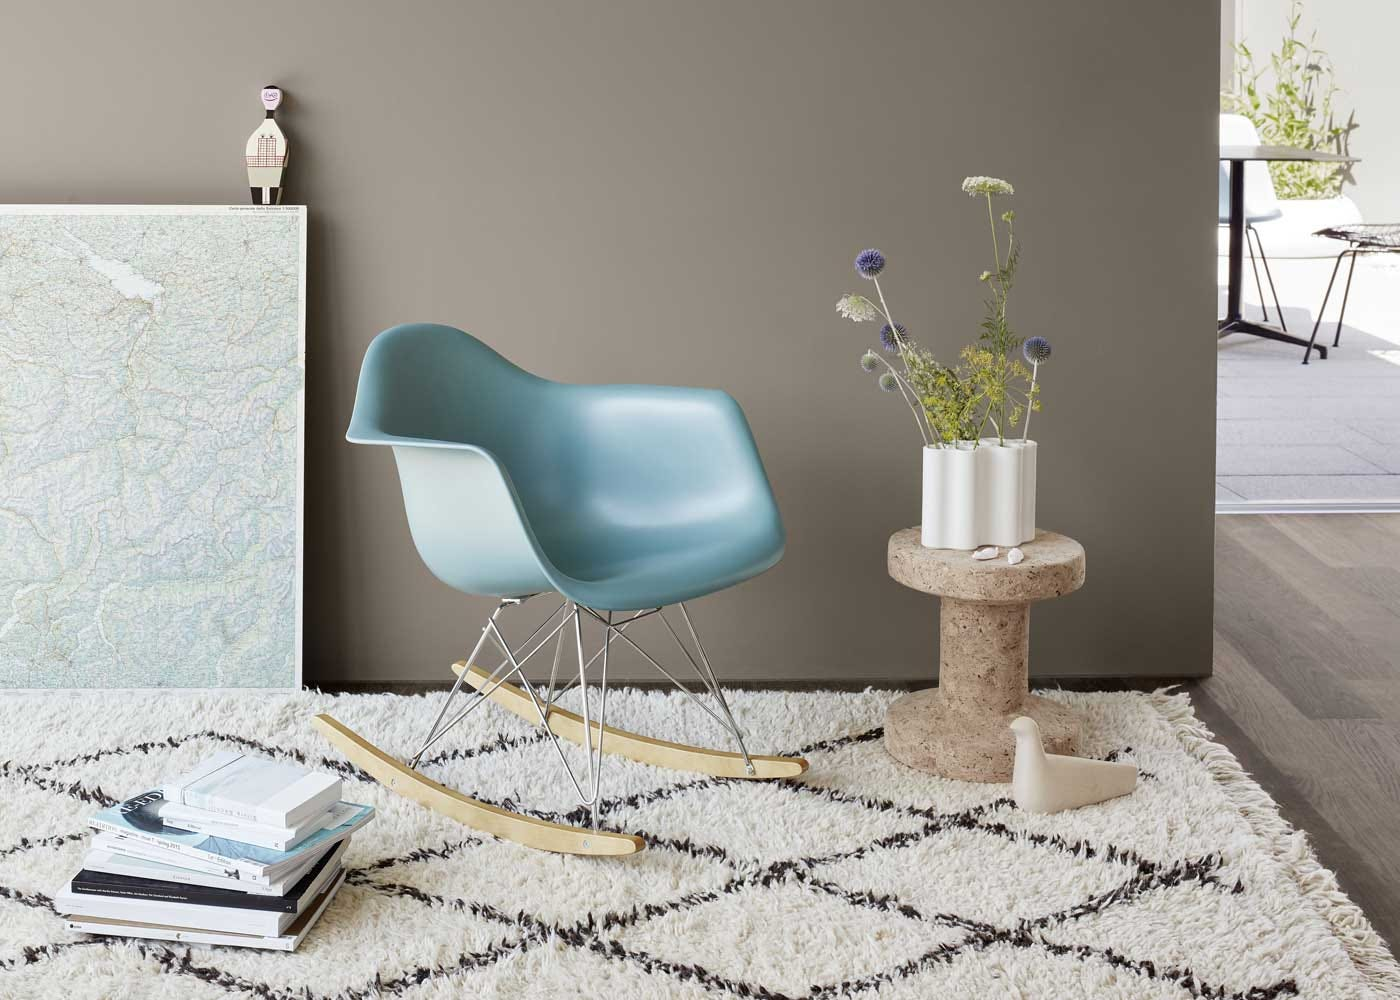 As shown: Eames RAR rocking chair ice grey